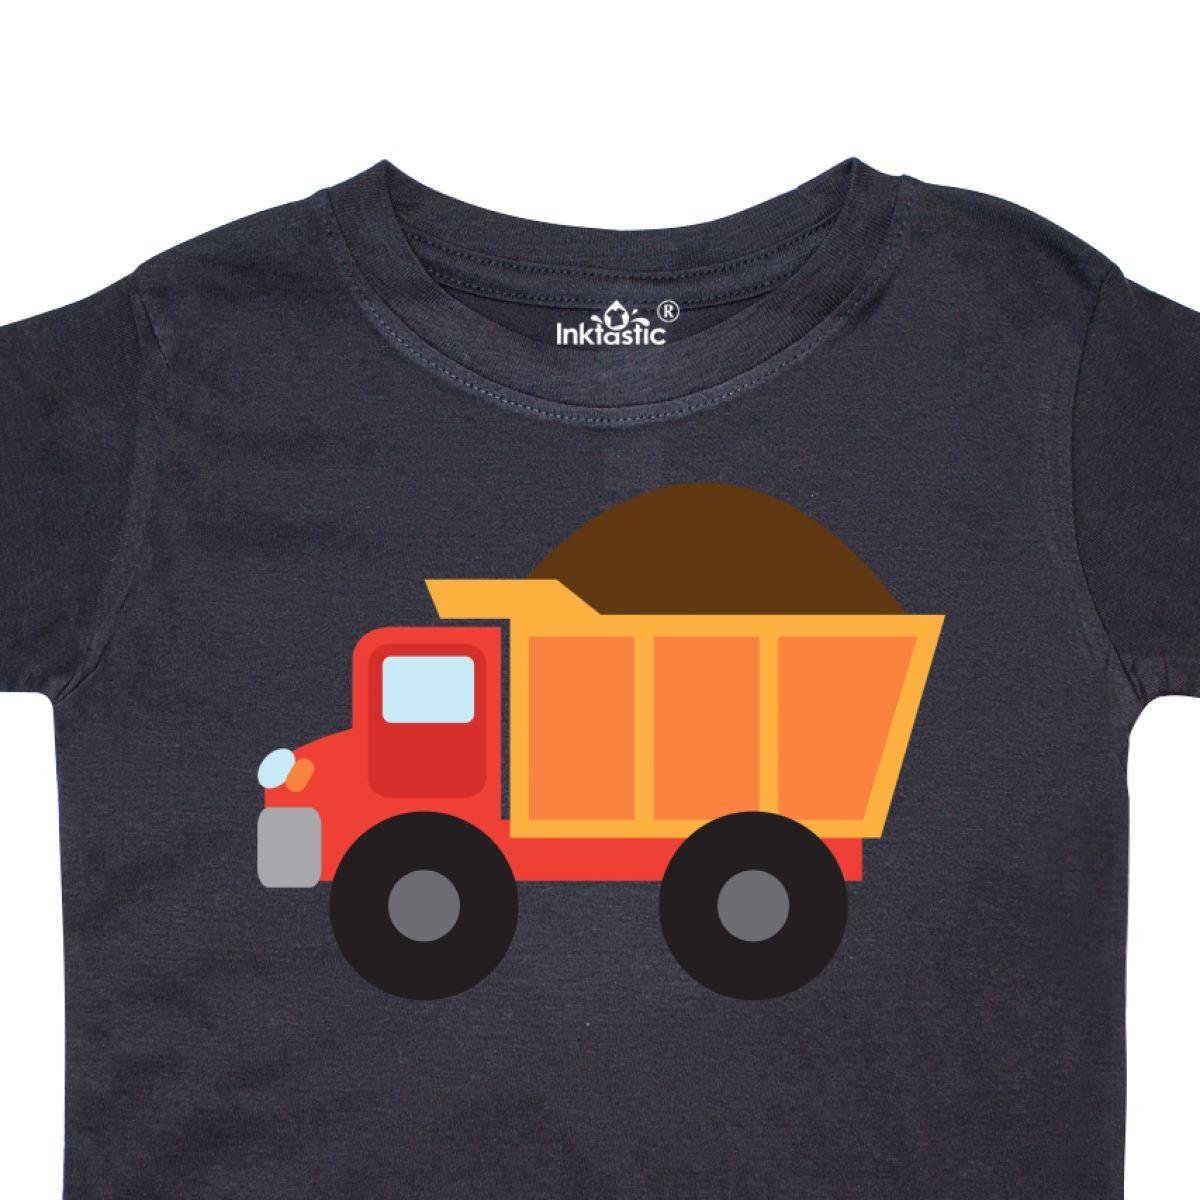 Inktastic-Work-Truck-Construction-Vehicle-Toddler-T-Shirt-Trucks-Vehicles-Cute thumbnail 6